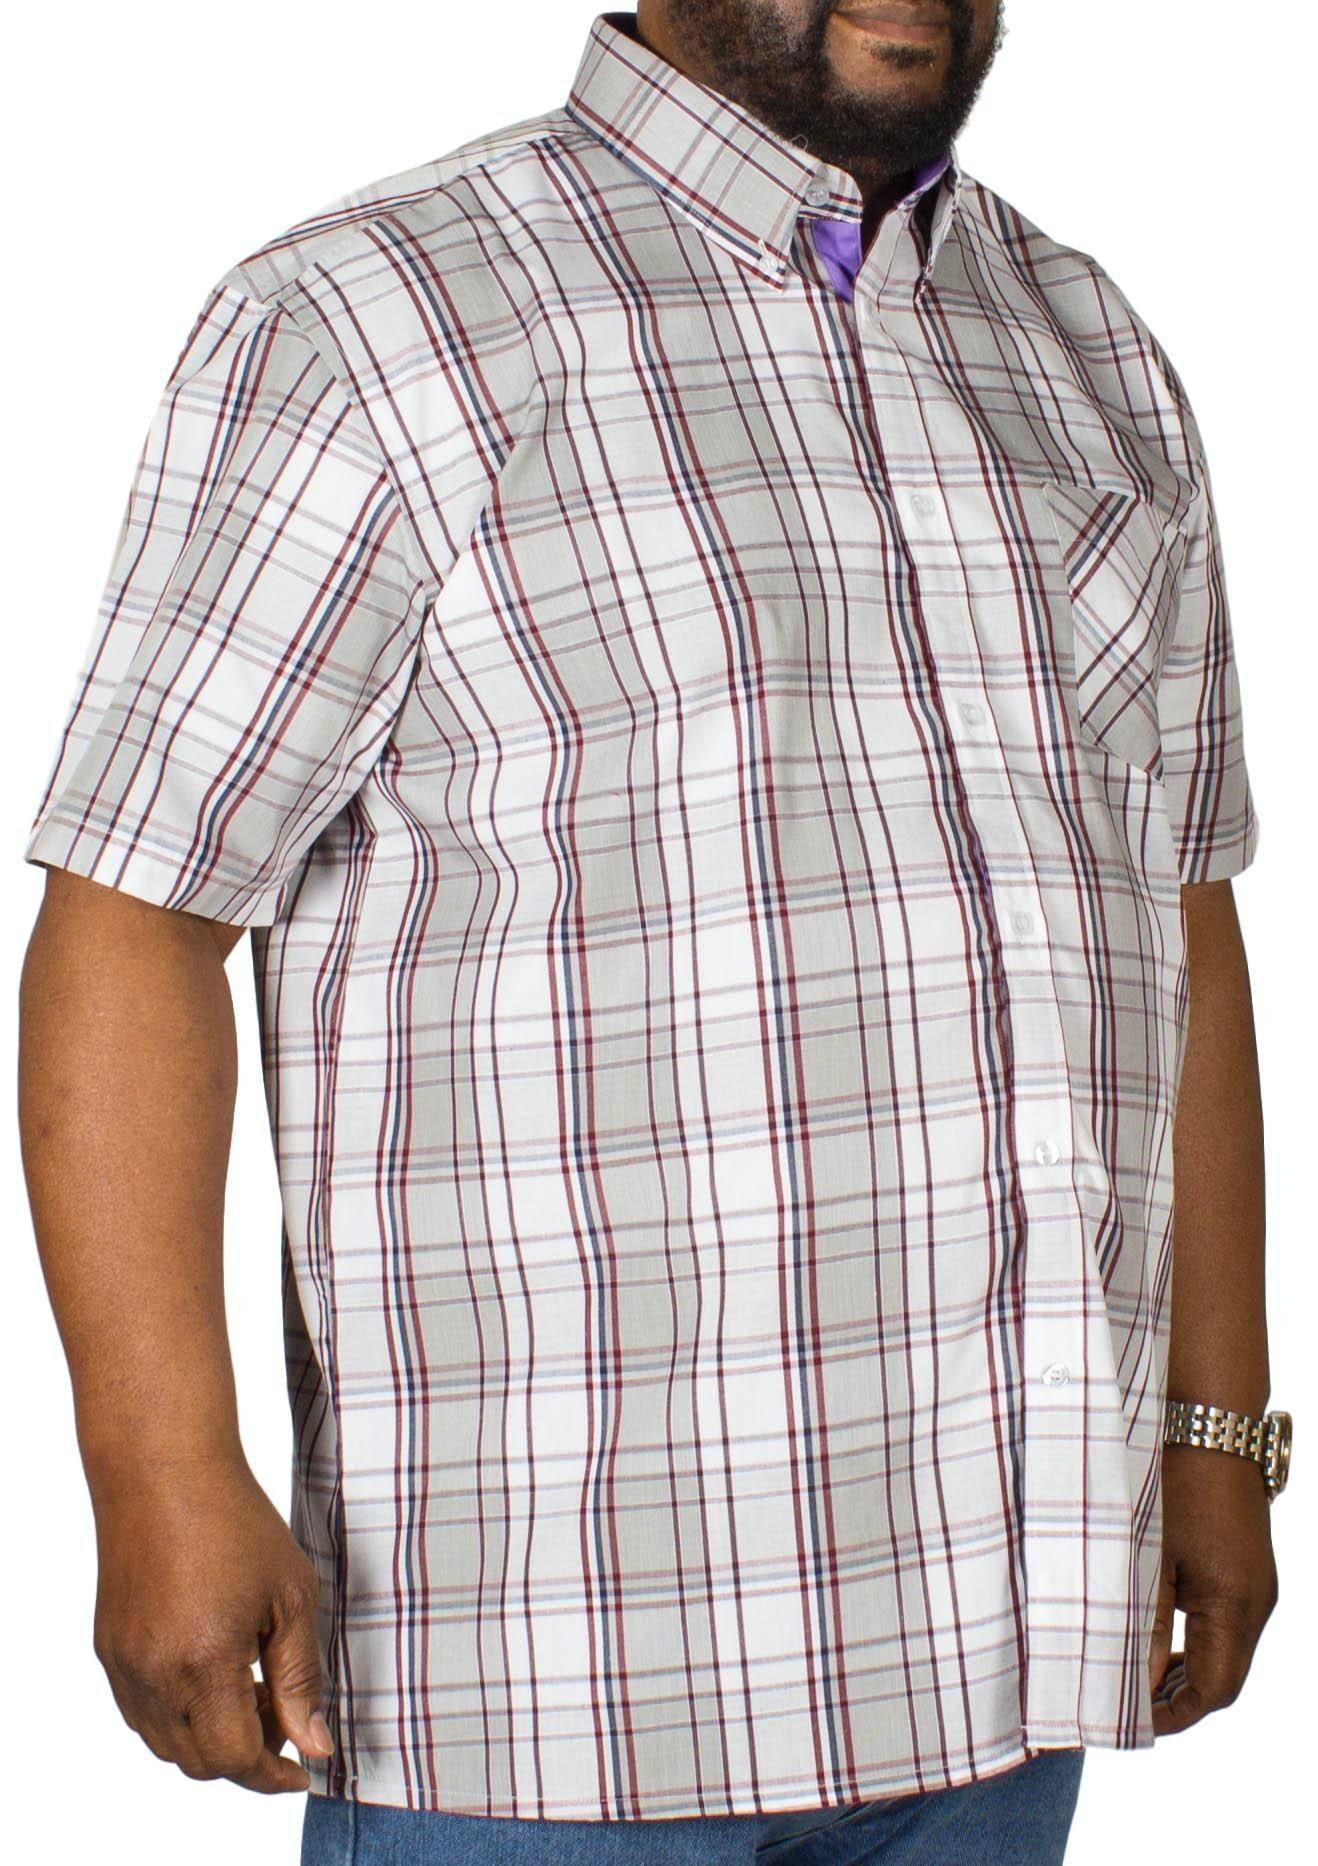 KAM Check Short Sleeved Shirt Charcoal